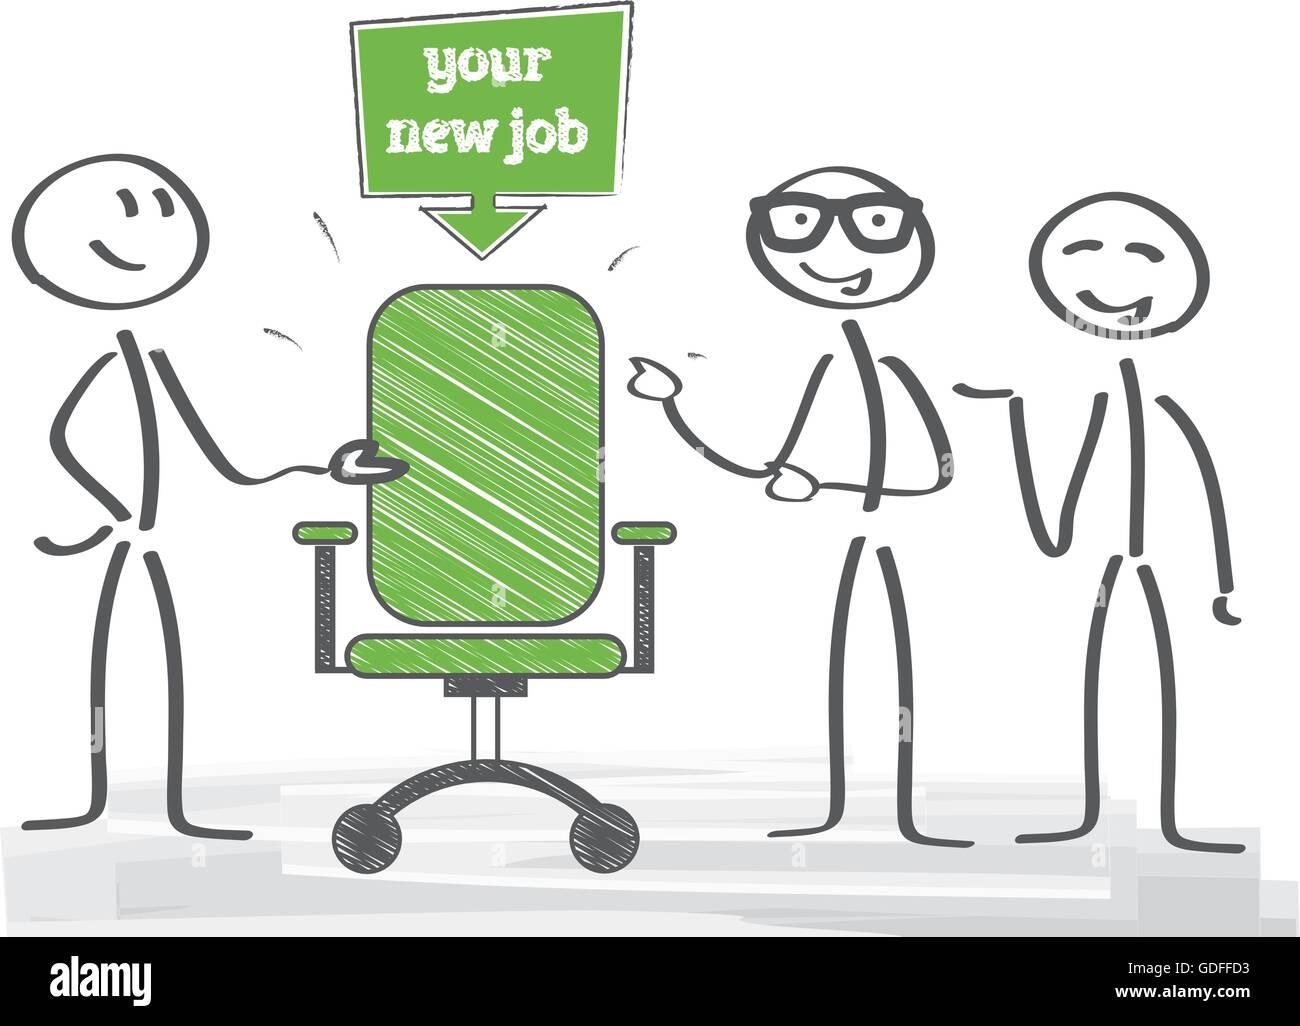 Start new career, your new job - Stock Image